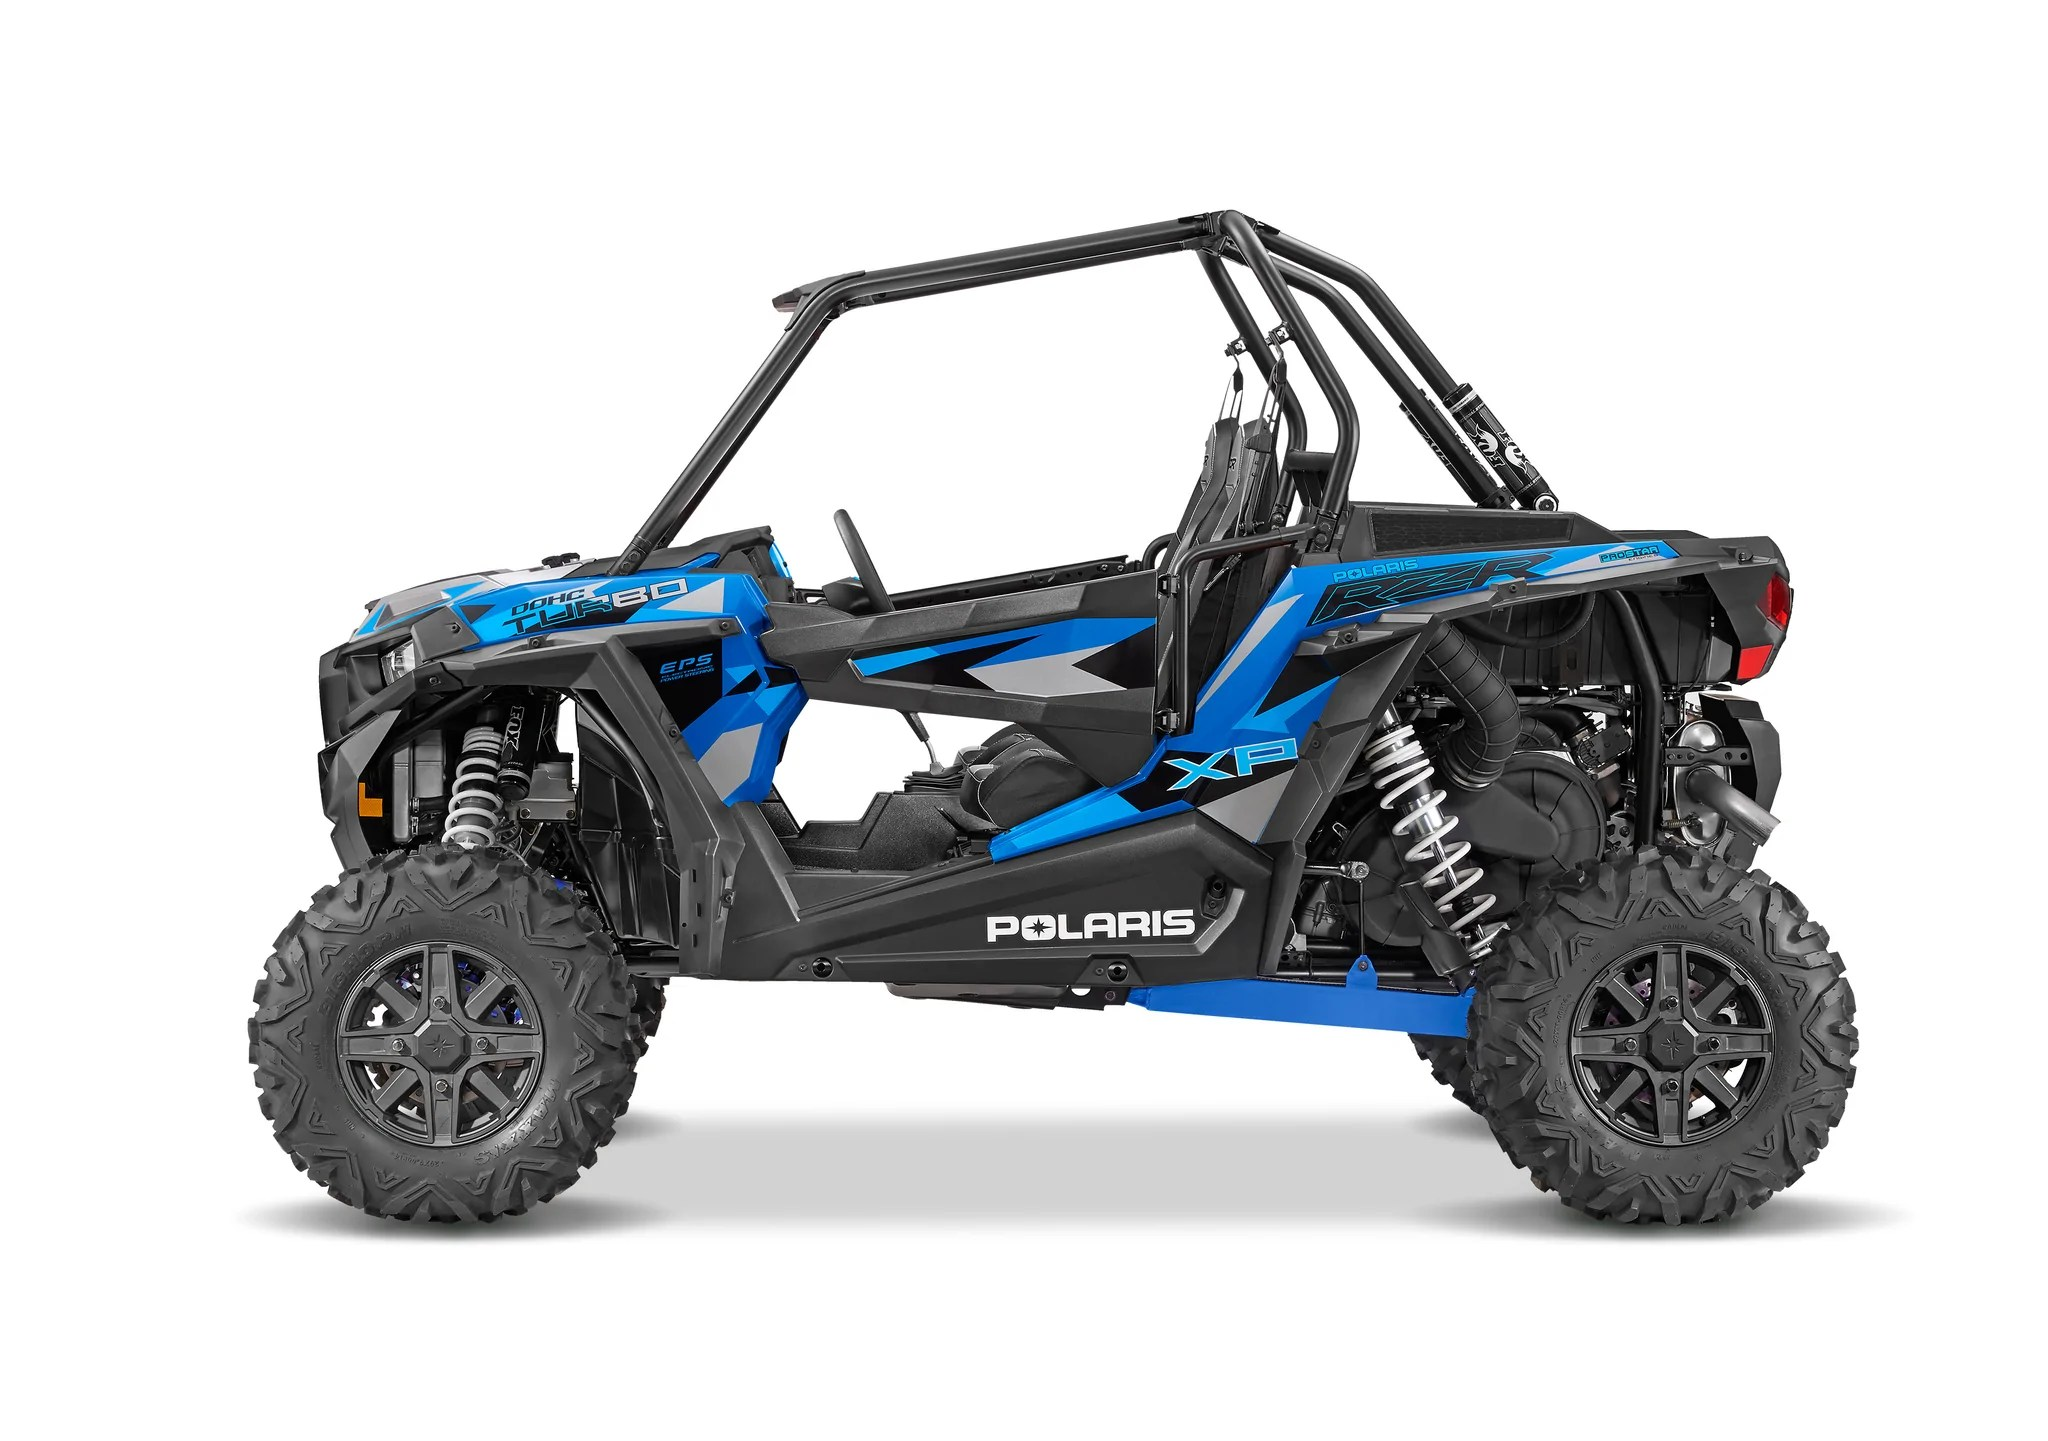 small resolution of ryco street legal kit for polaris rzr turbo s turbo 1000 900 2015